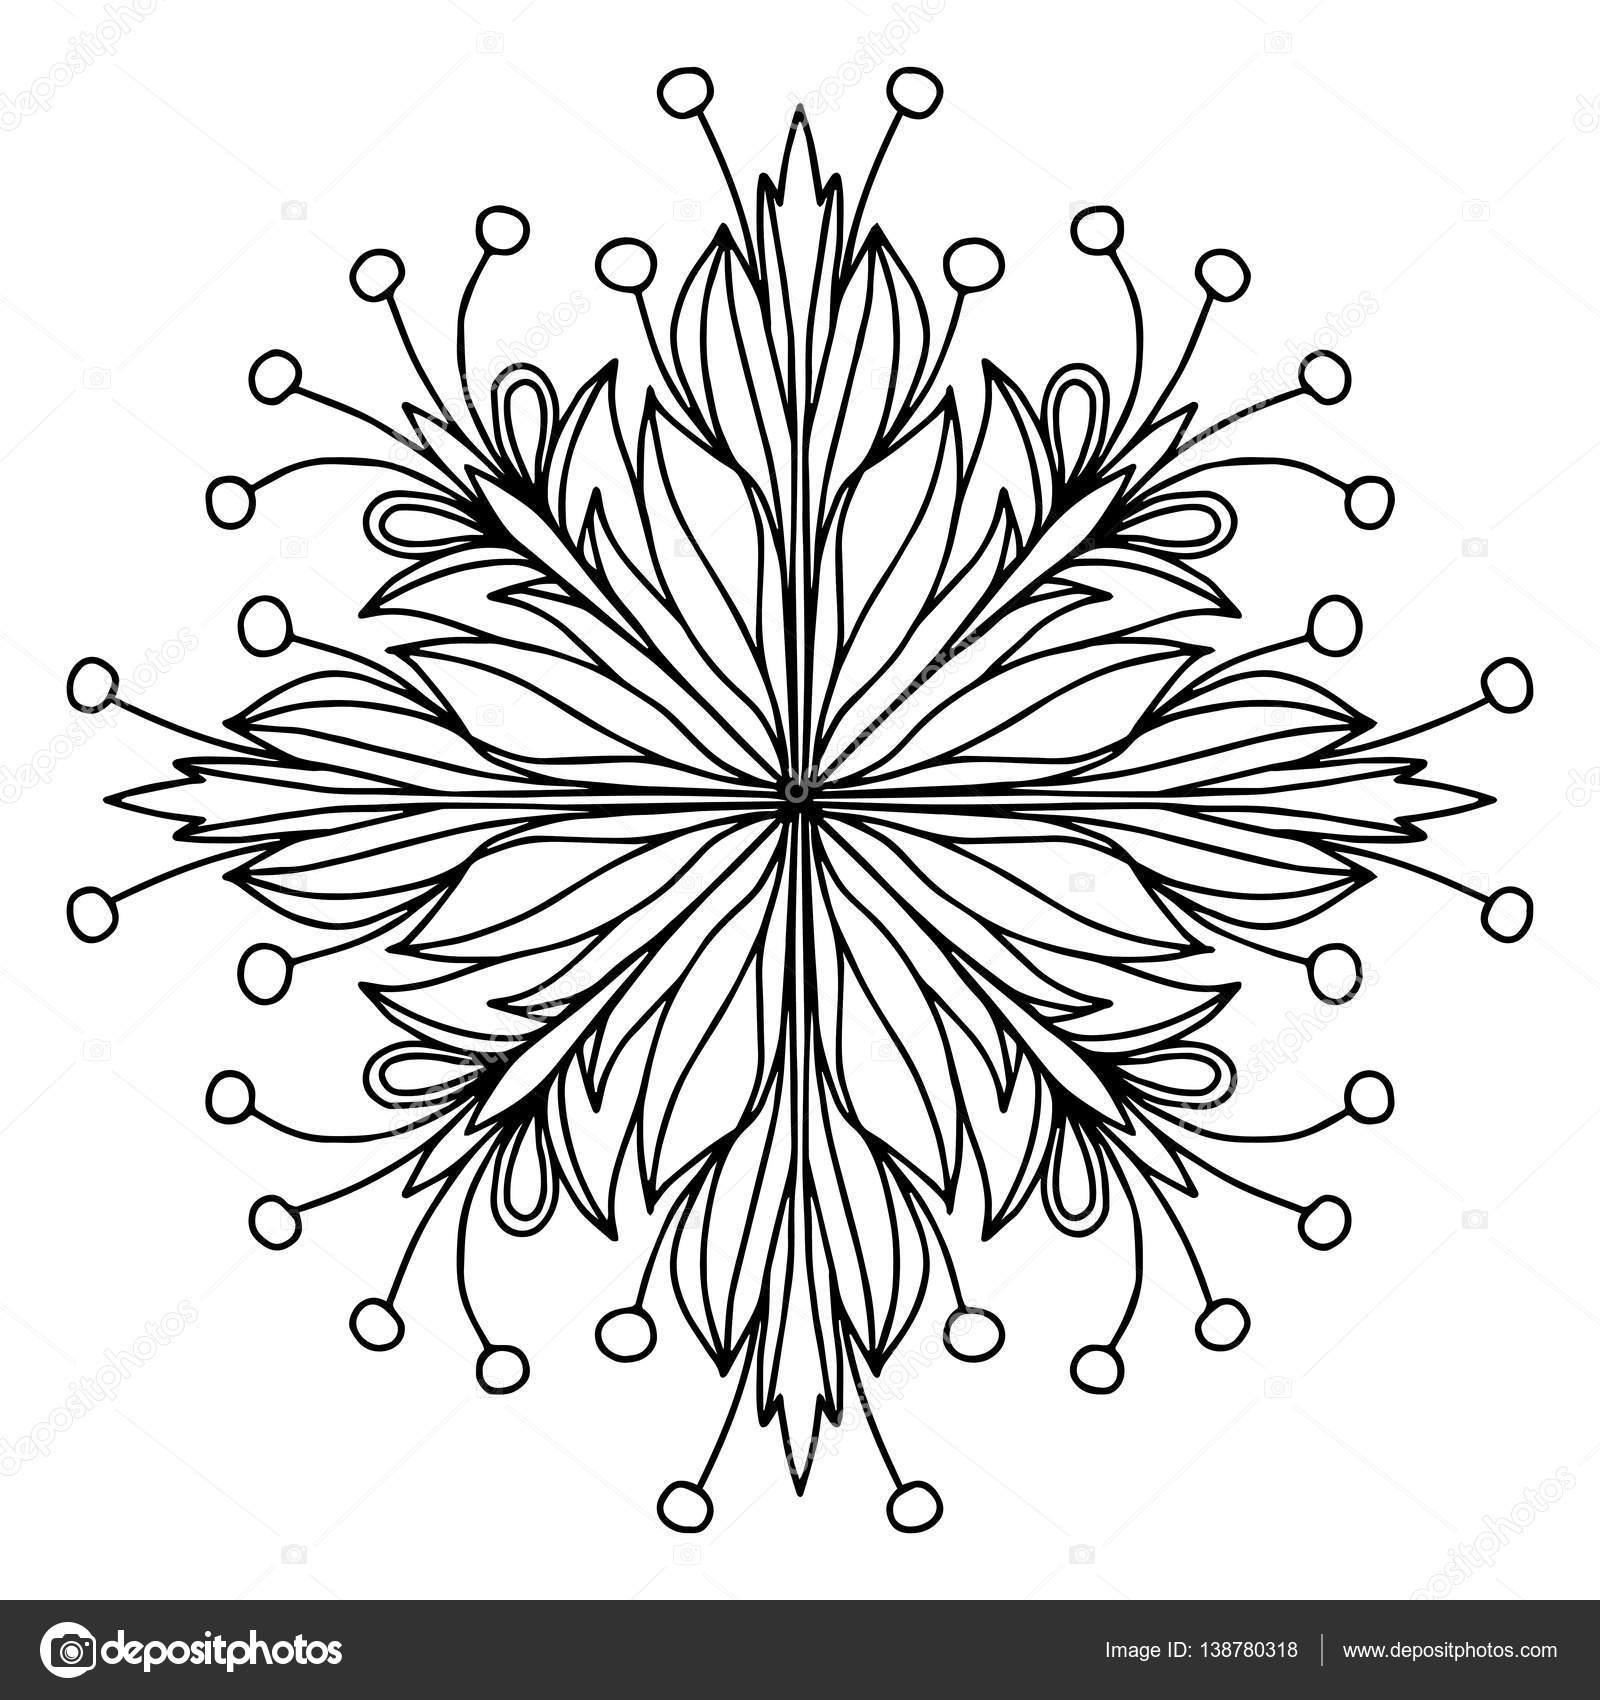 Mandala Malvorlagen Seite doodle — Stockvektor © OrigaZ #138780318